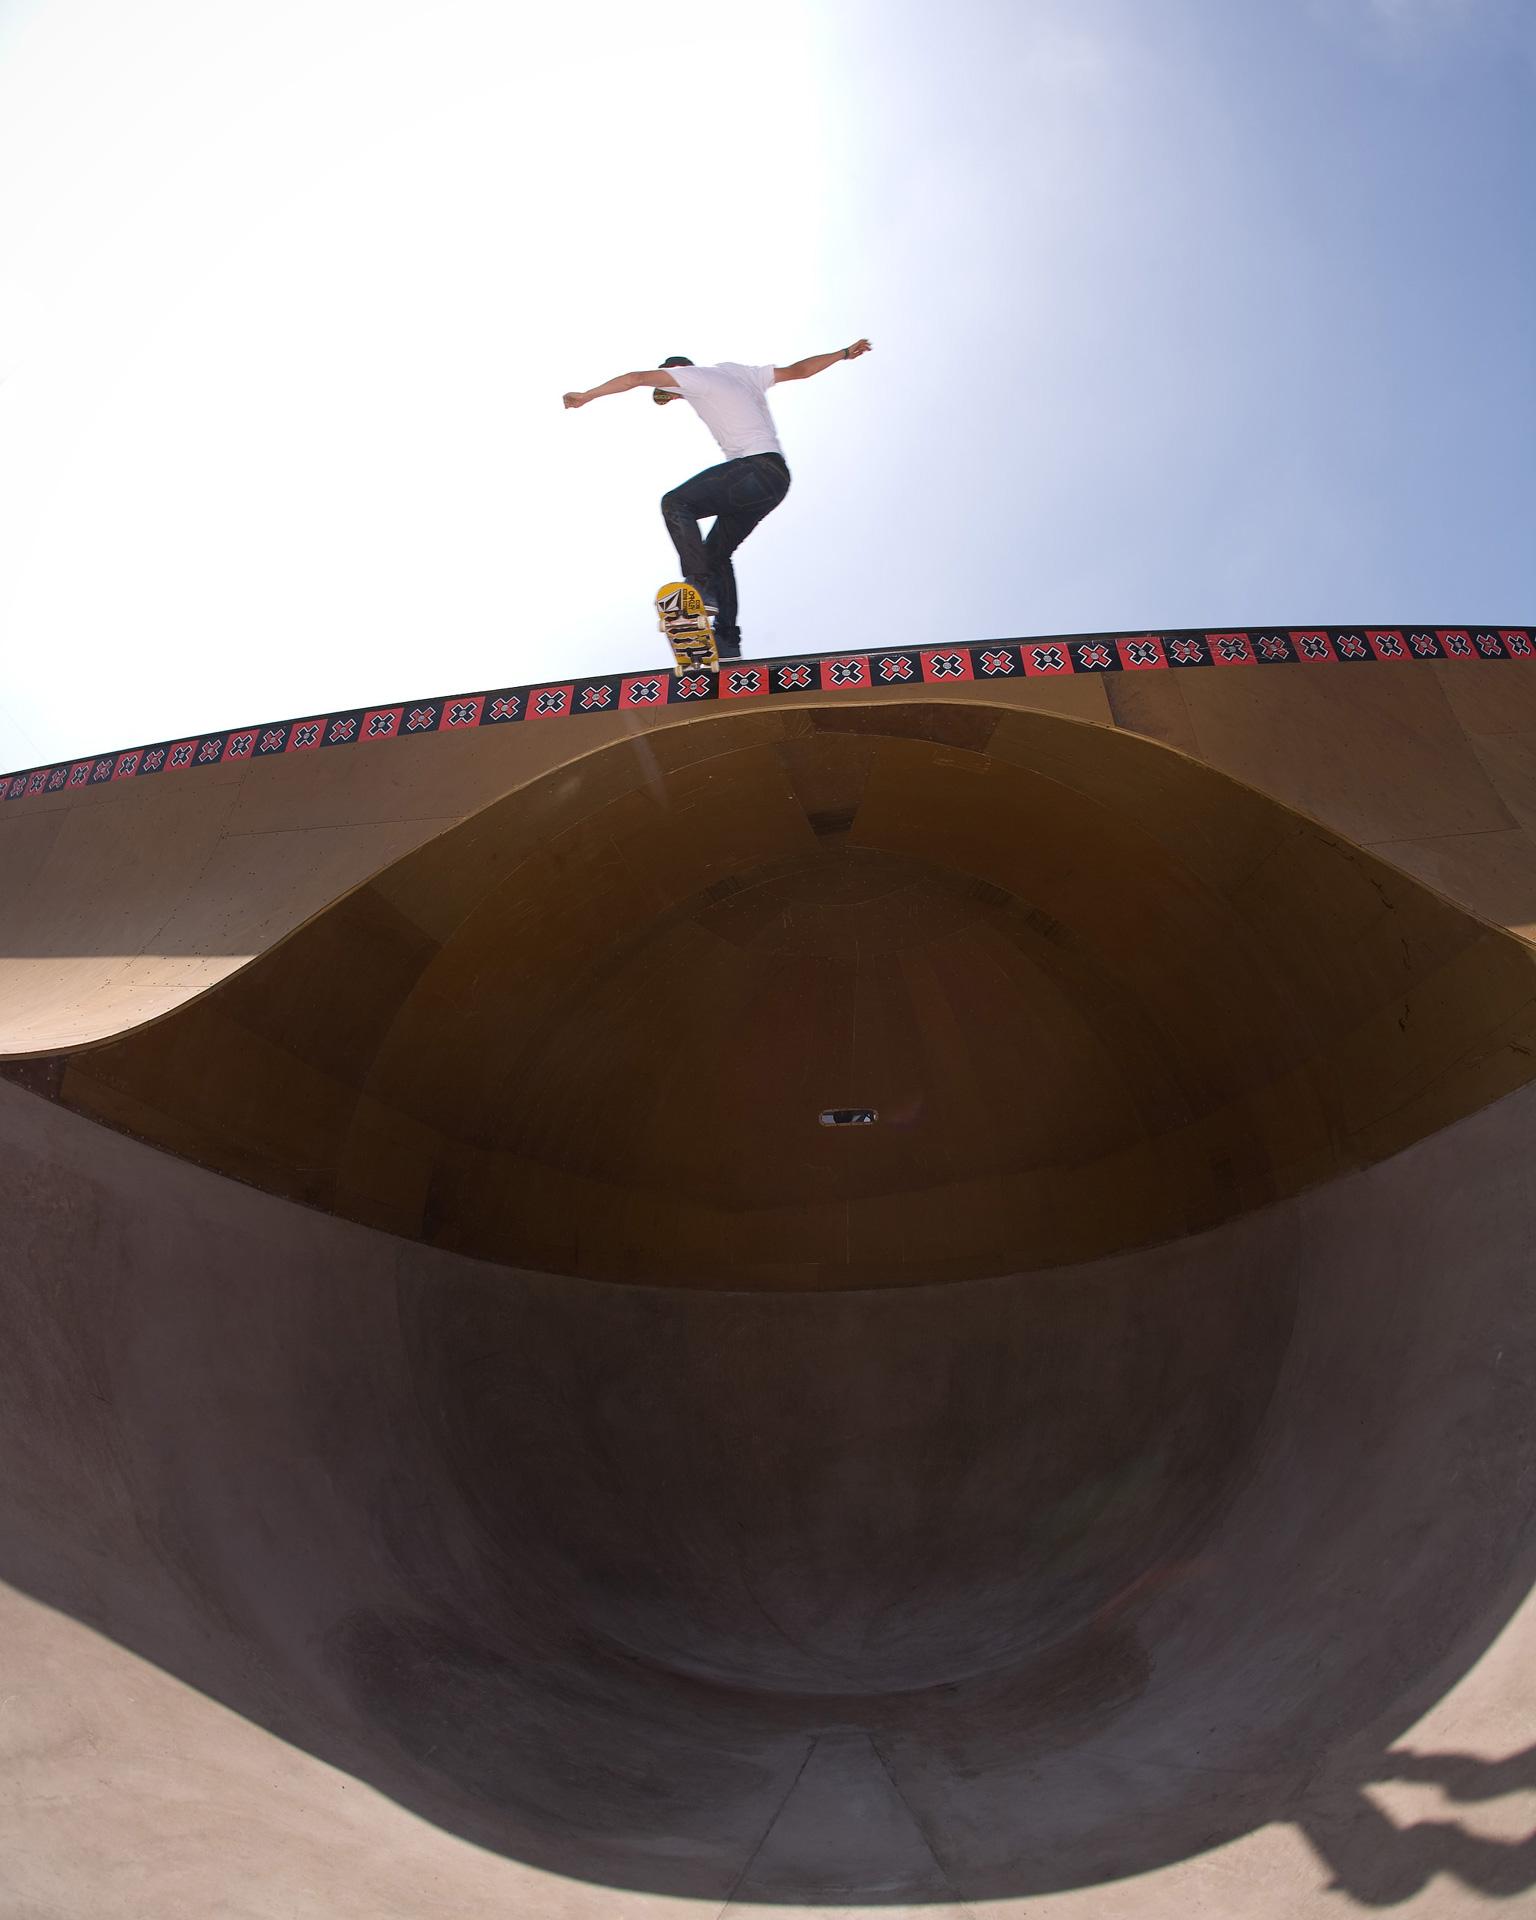 Skateboard Park gets a face-lift, 2009